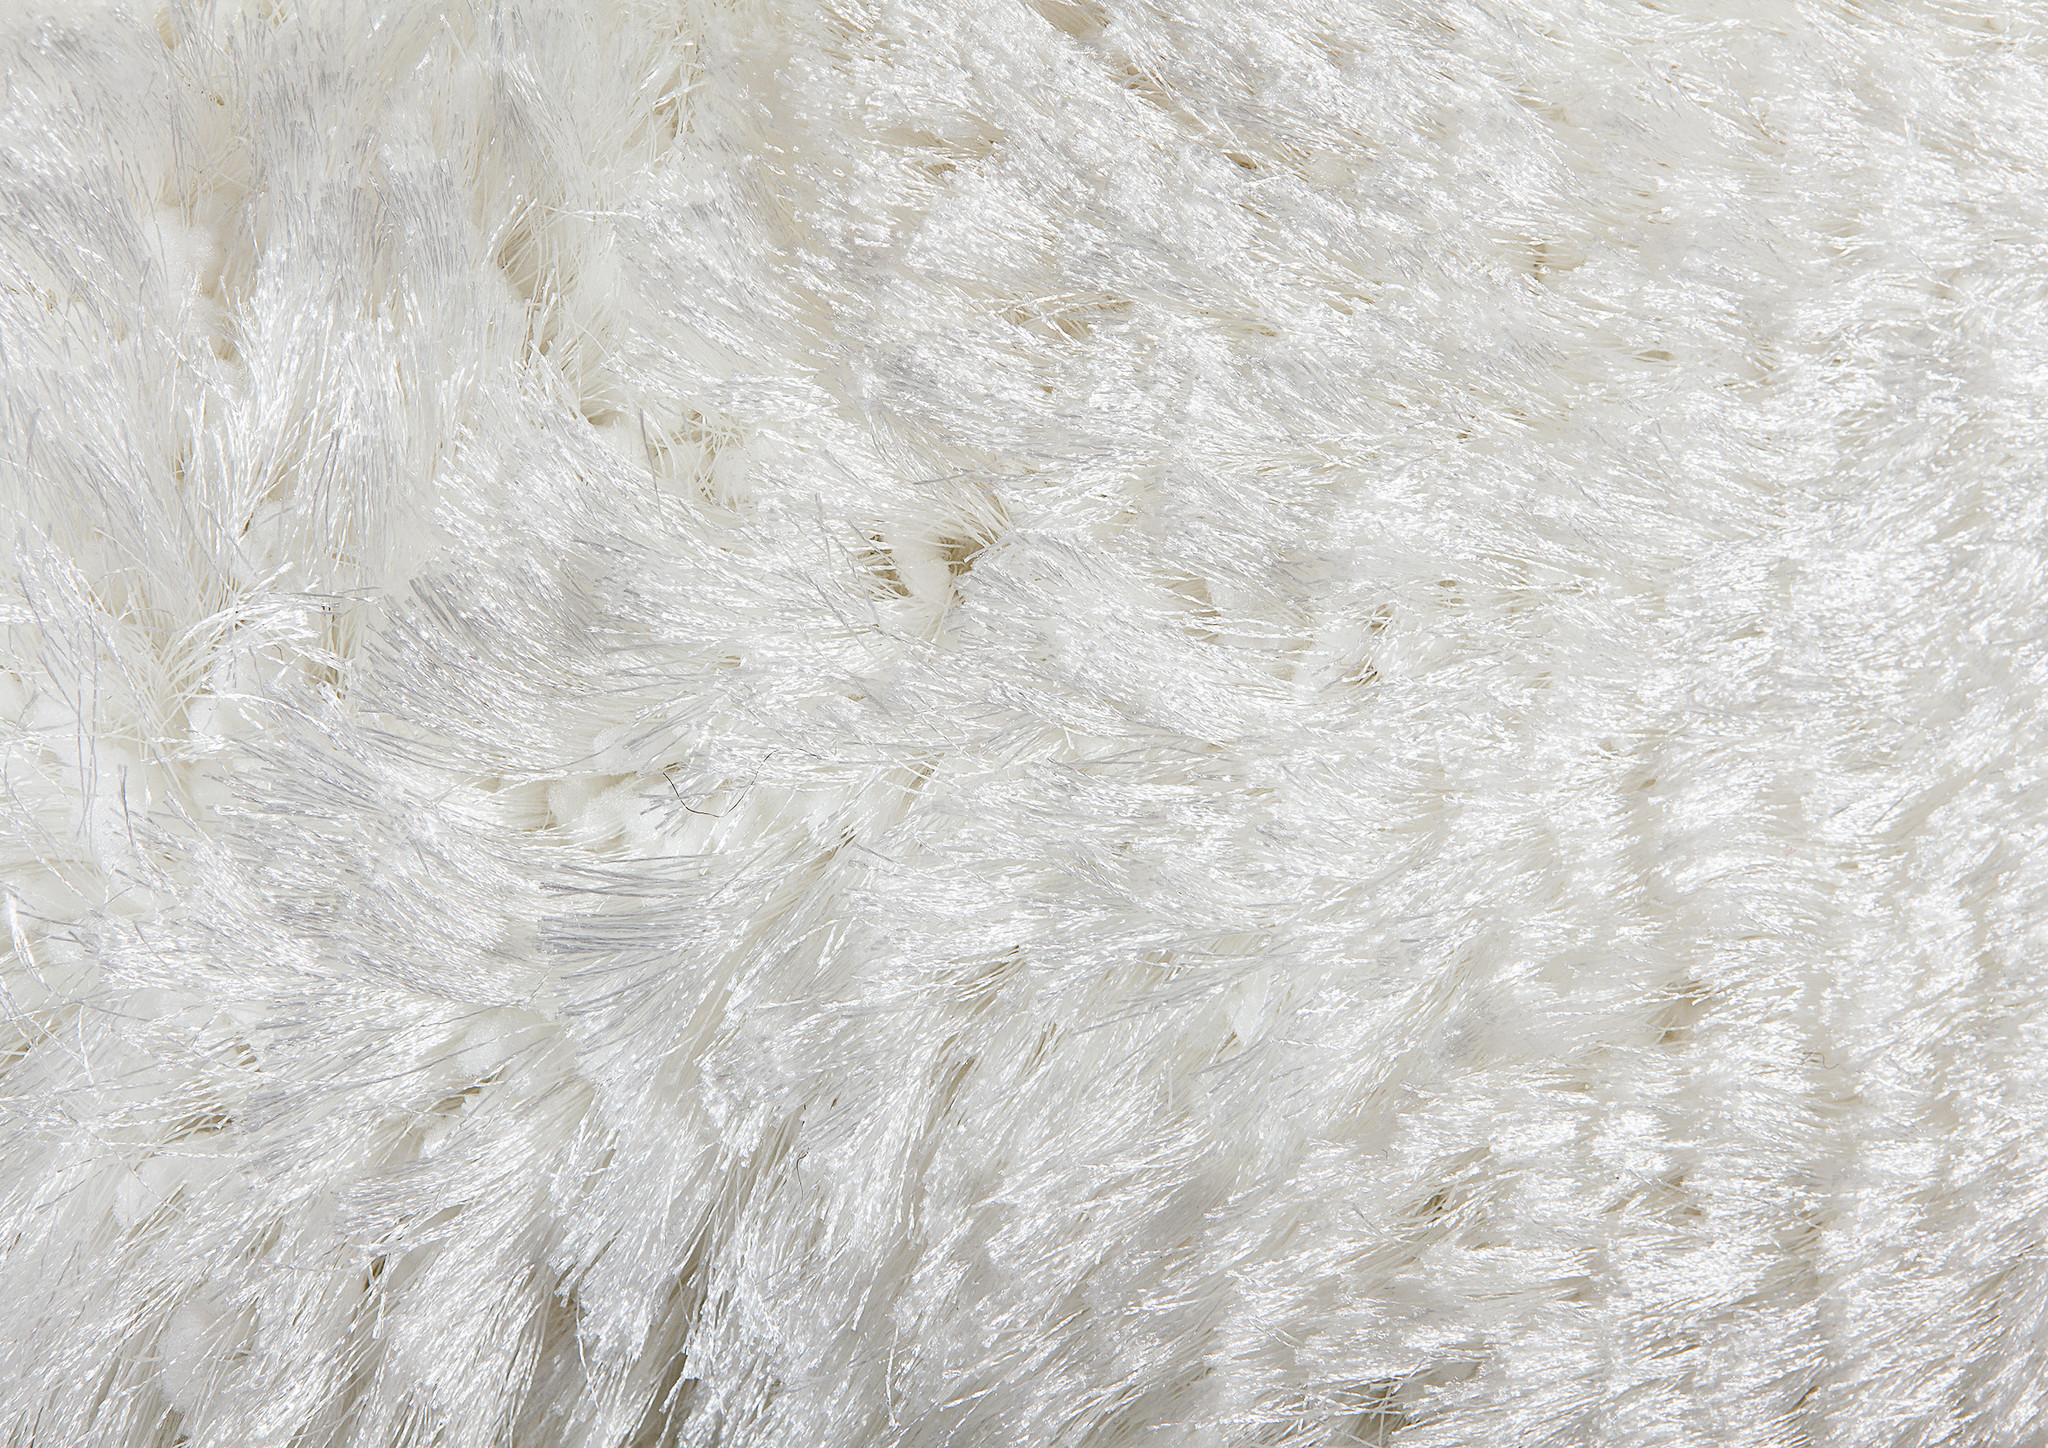 Vloerkleed Adore 100 170x240cm-7